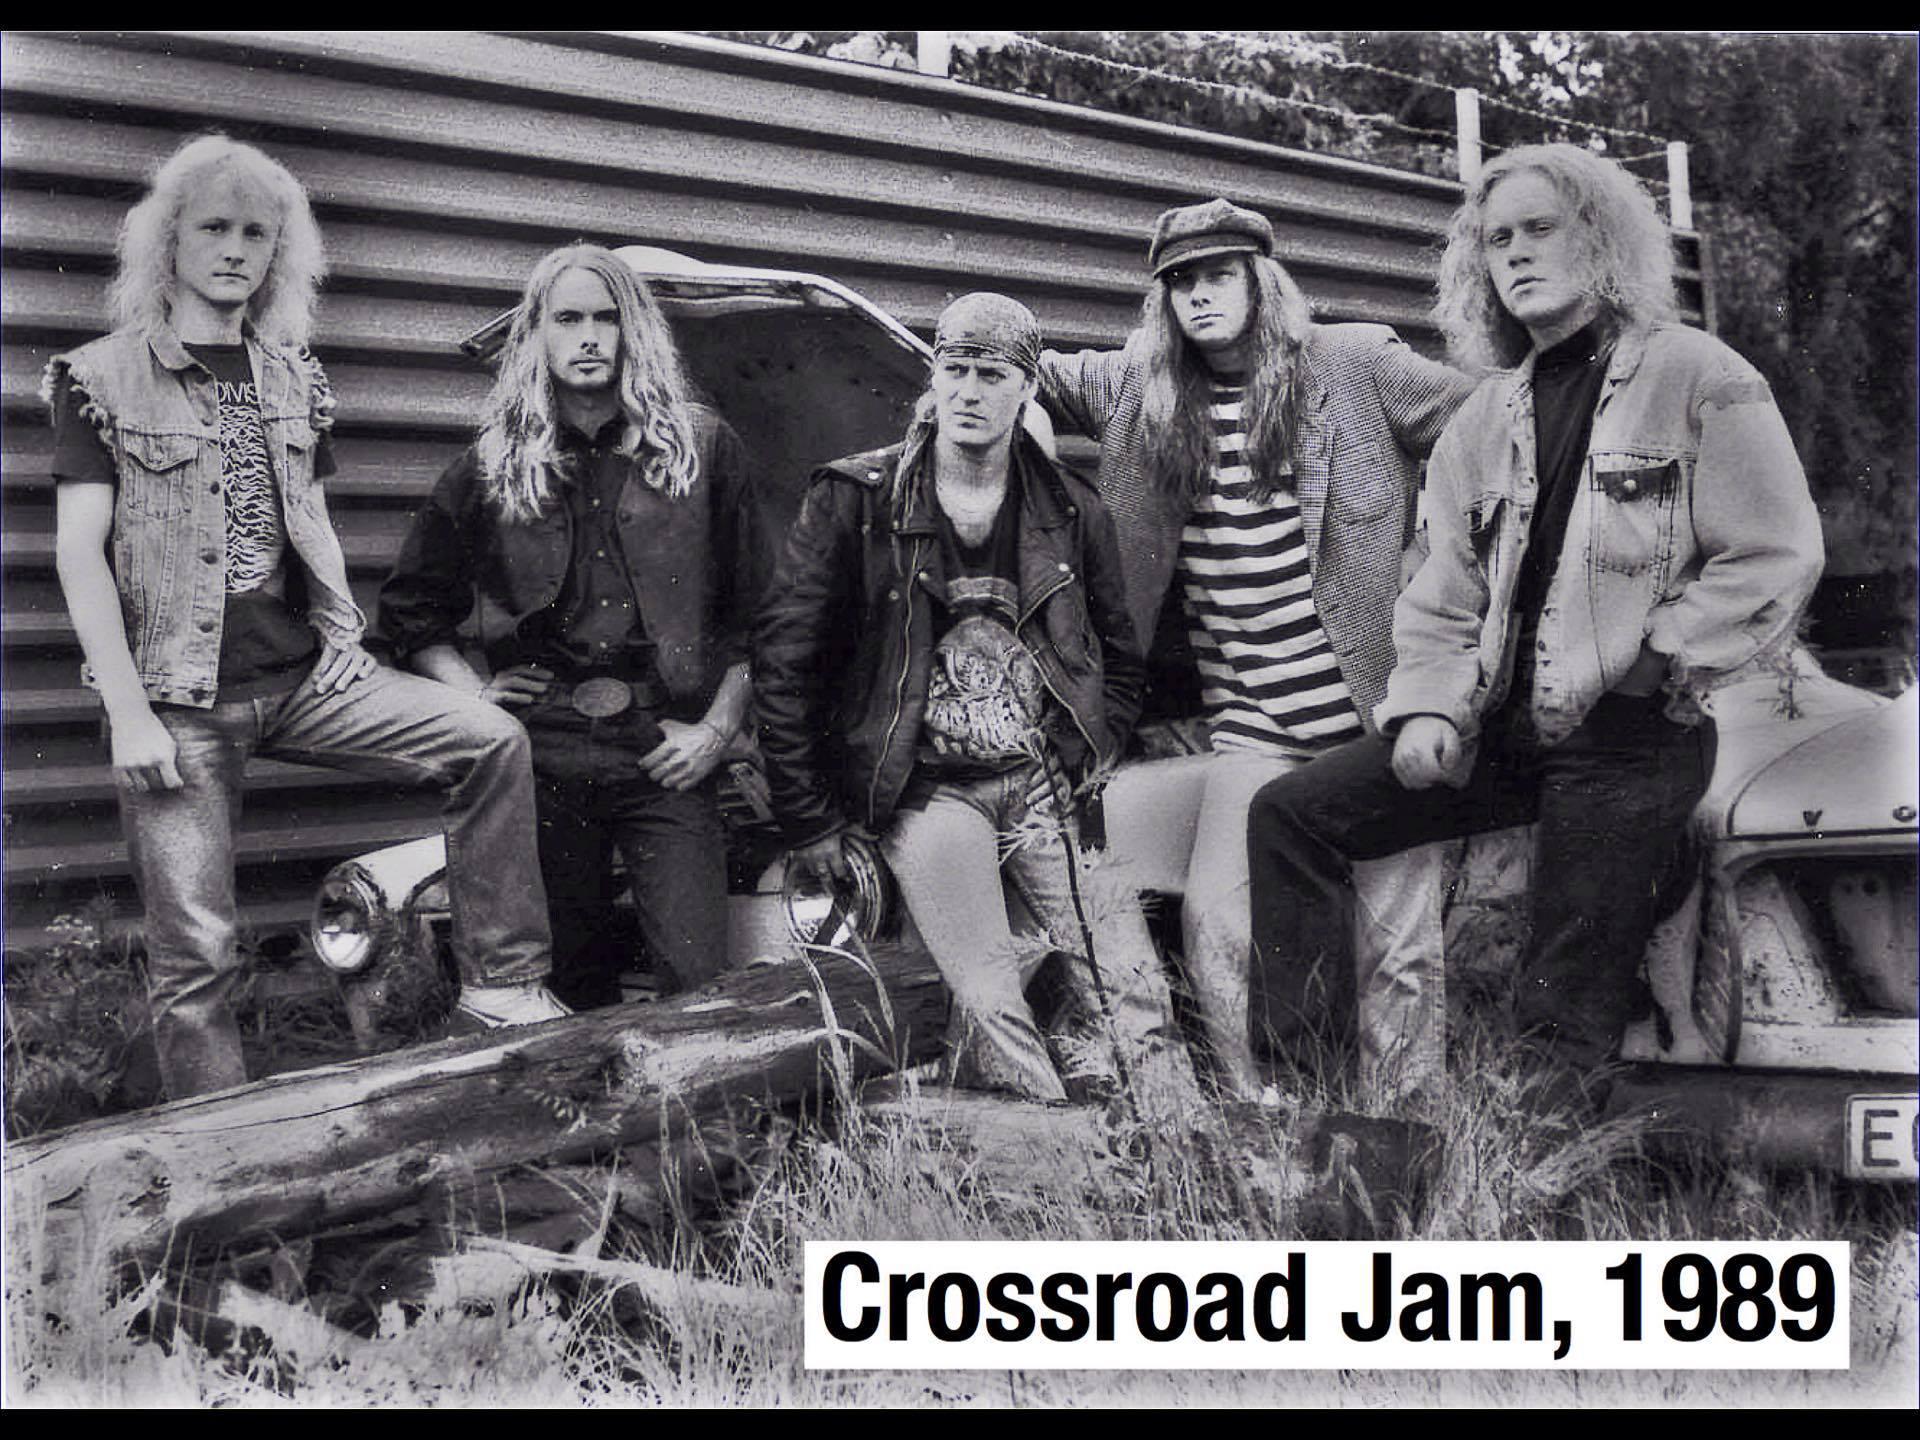 Crossroad Jam